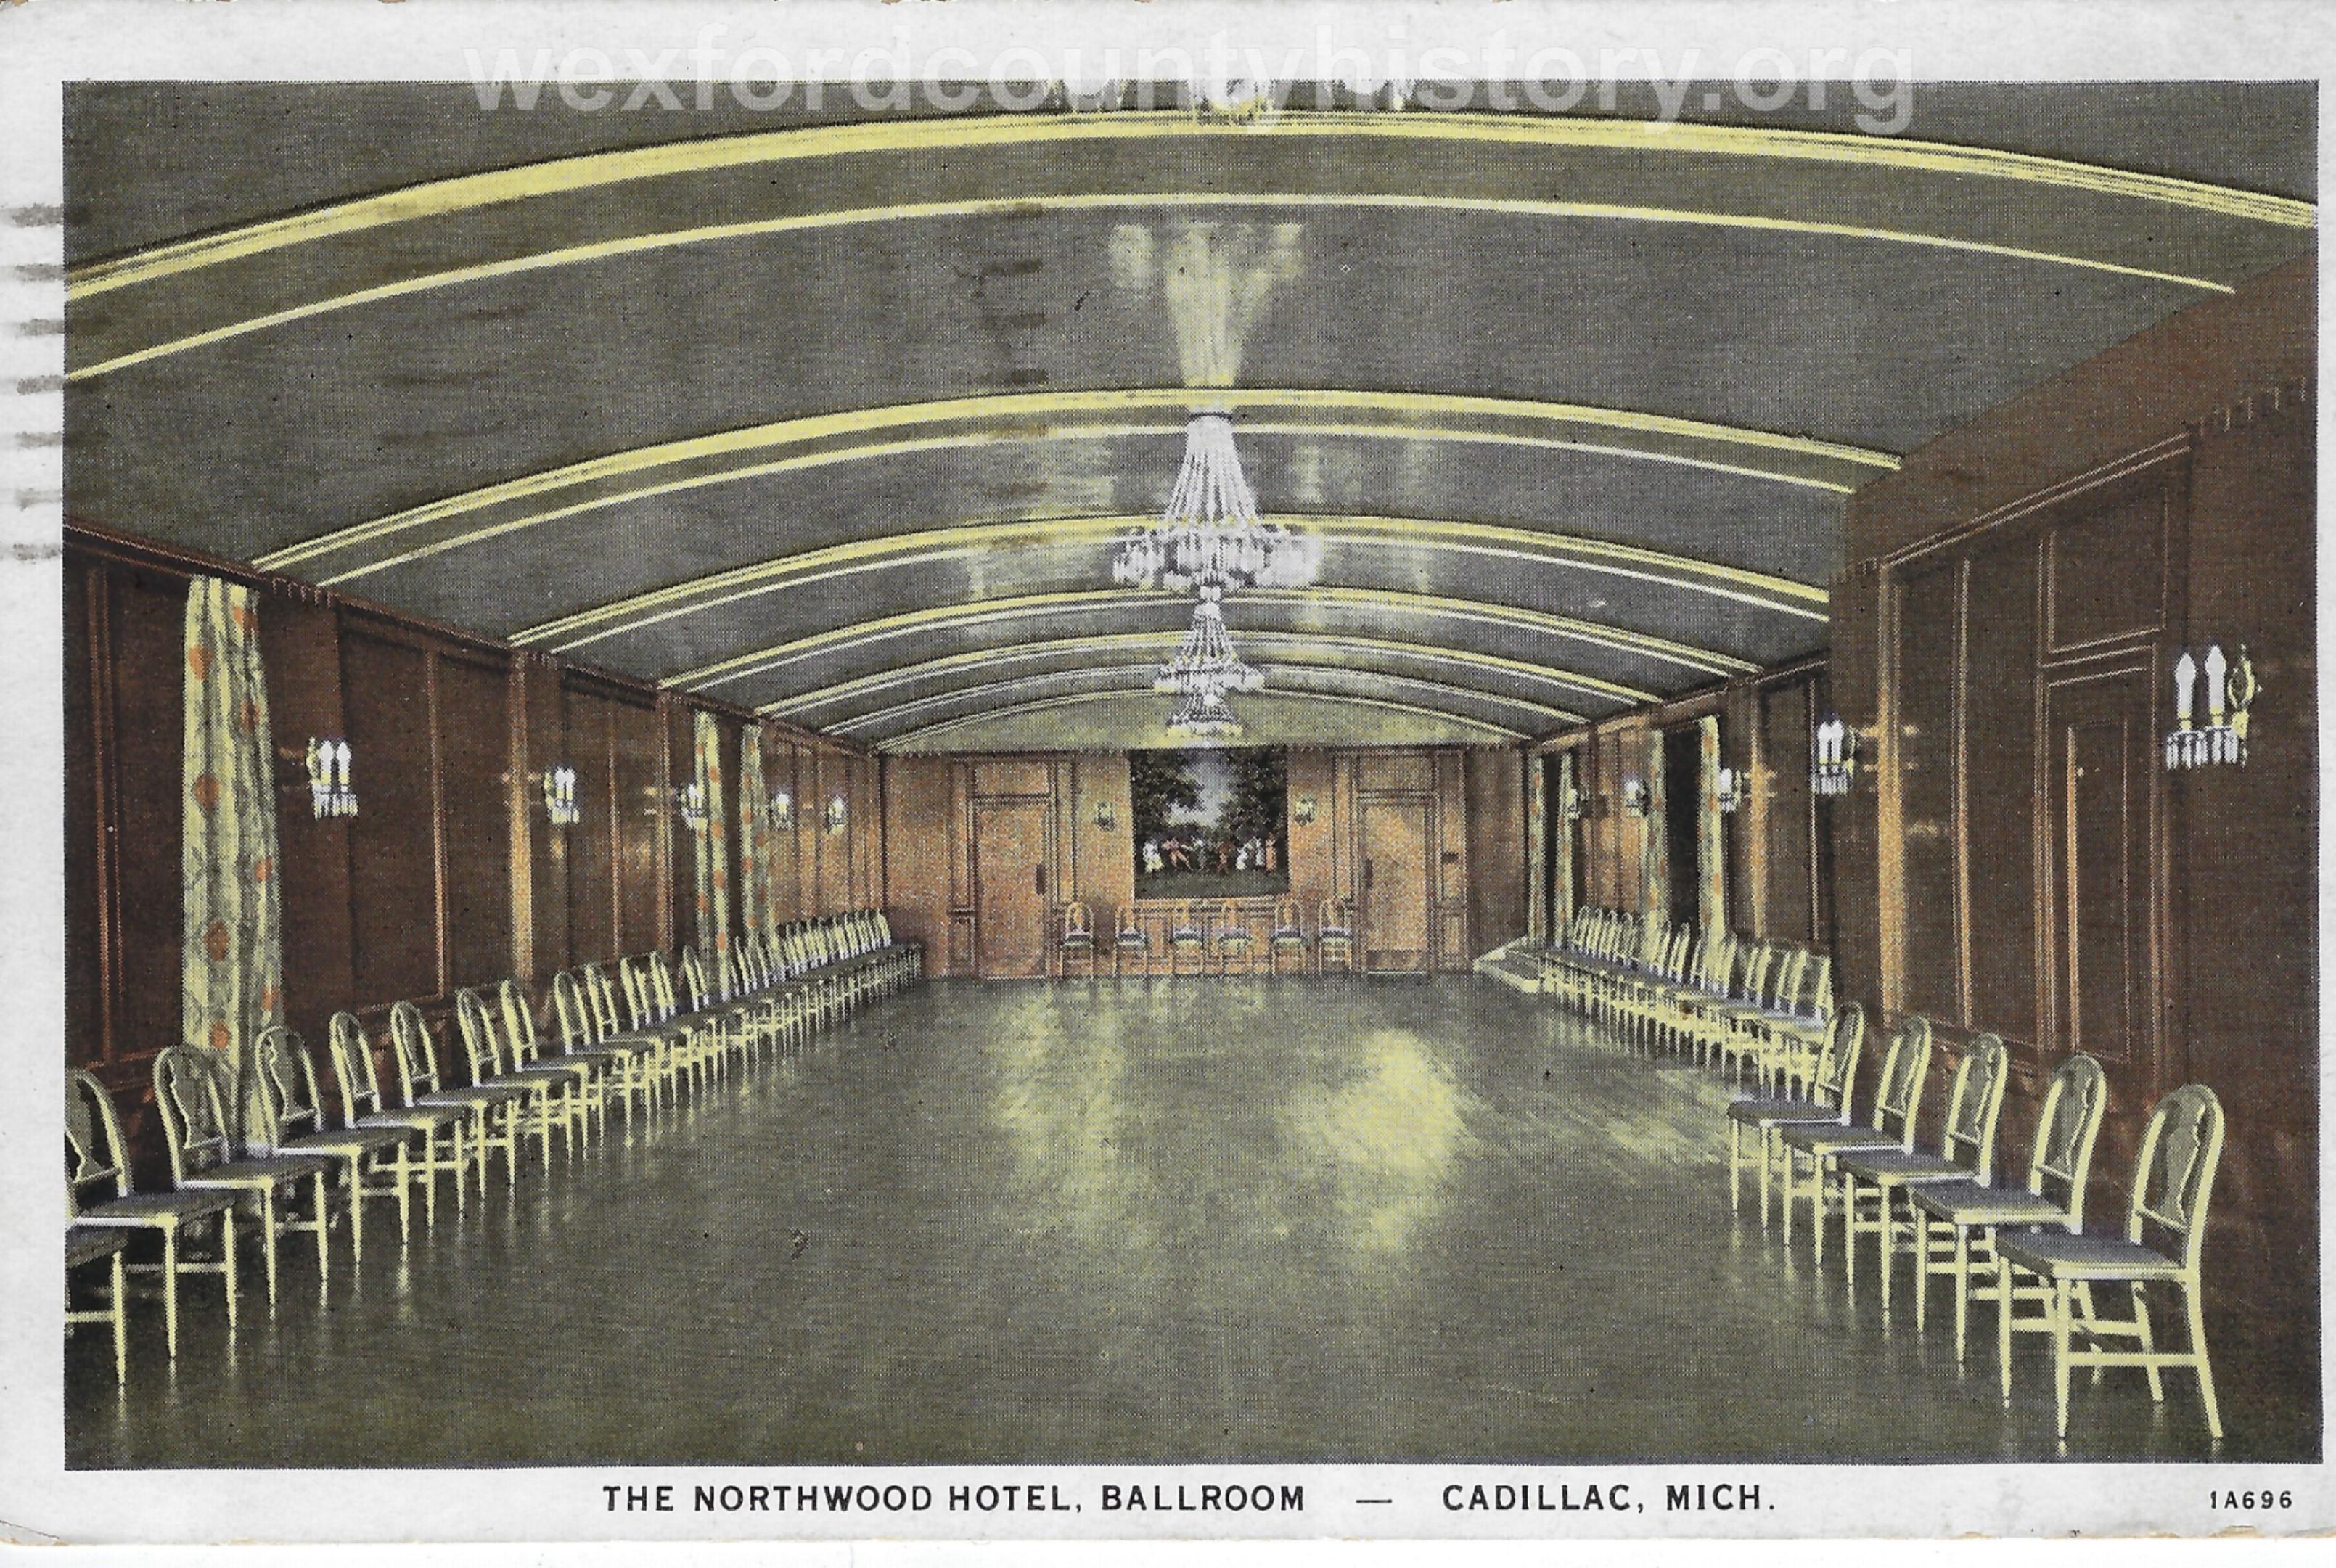 Northwood Hotel Ballroom